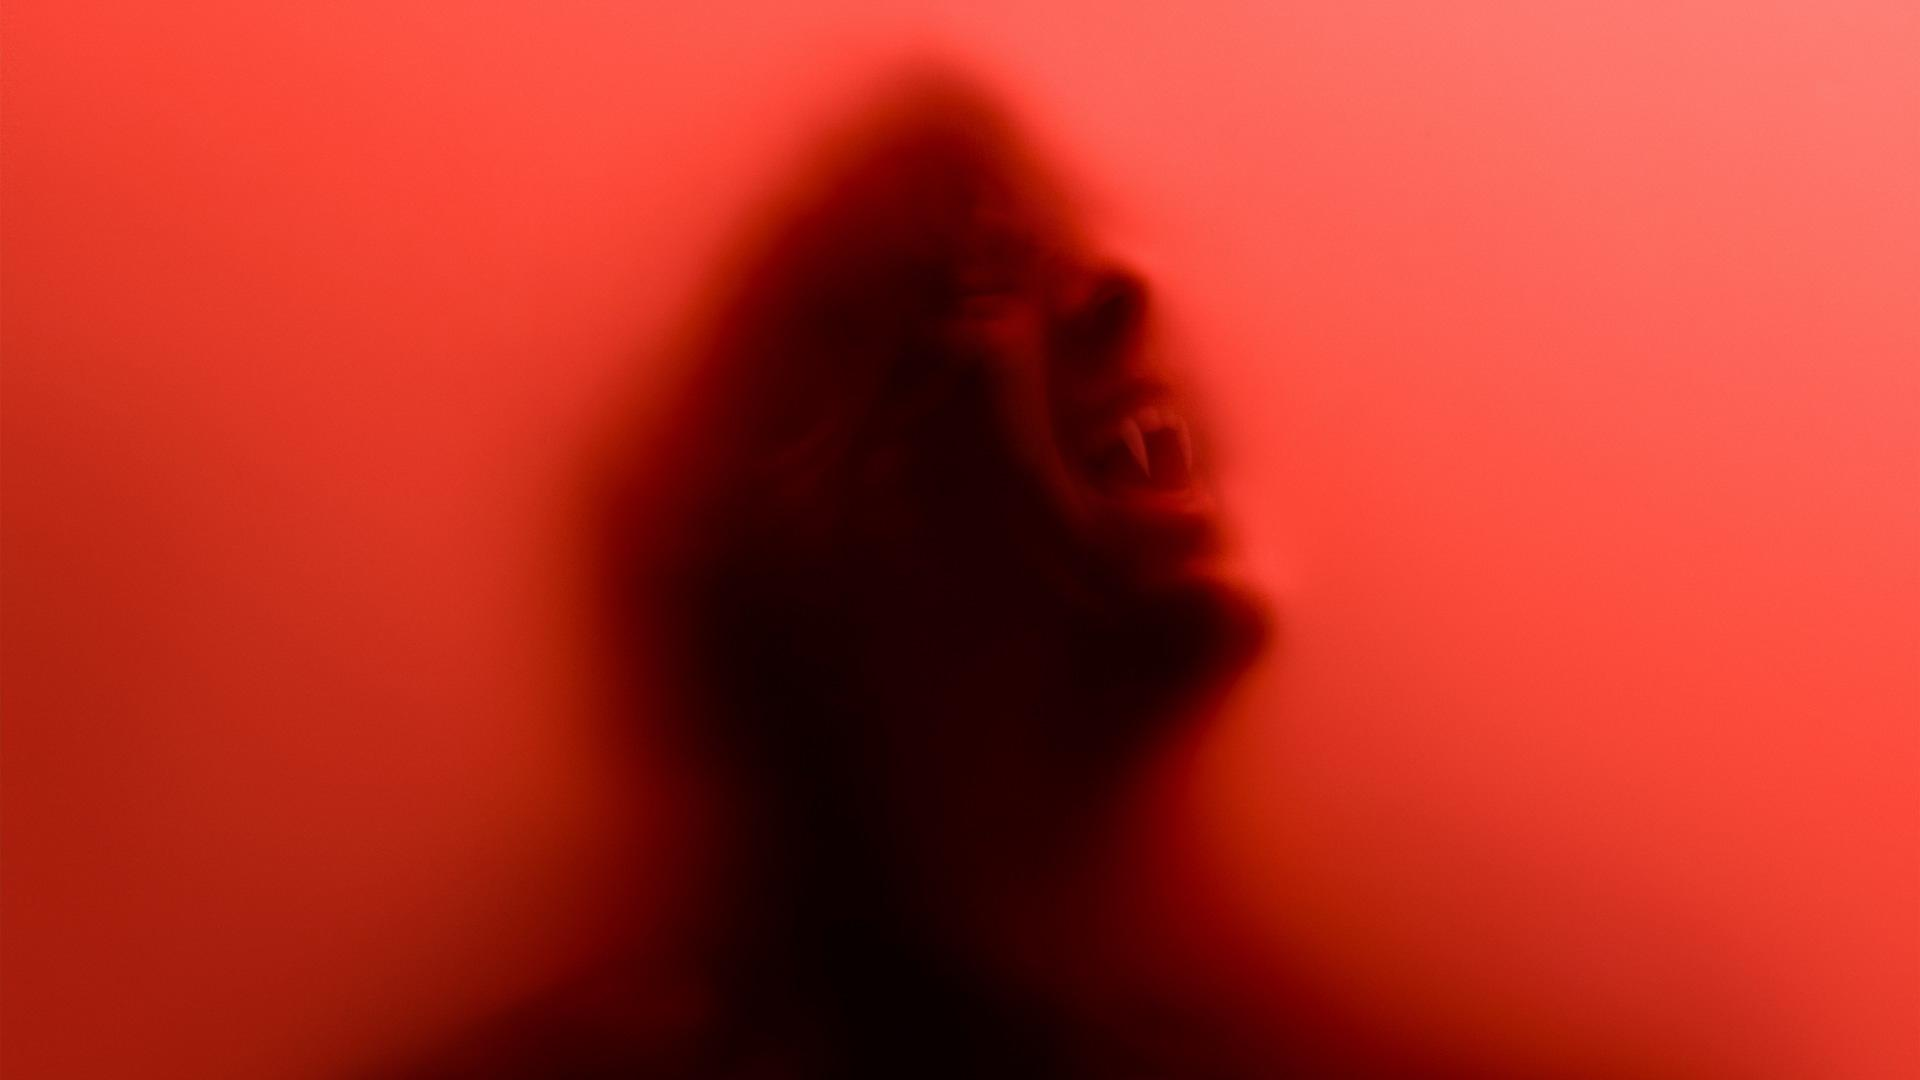 hd hintergrundbilder bill compton stephen moyer true blood 1920x1080